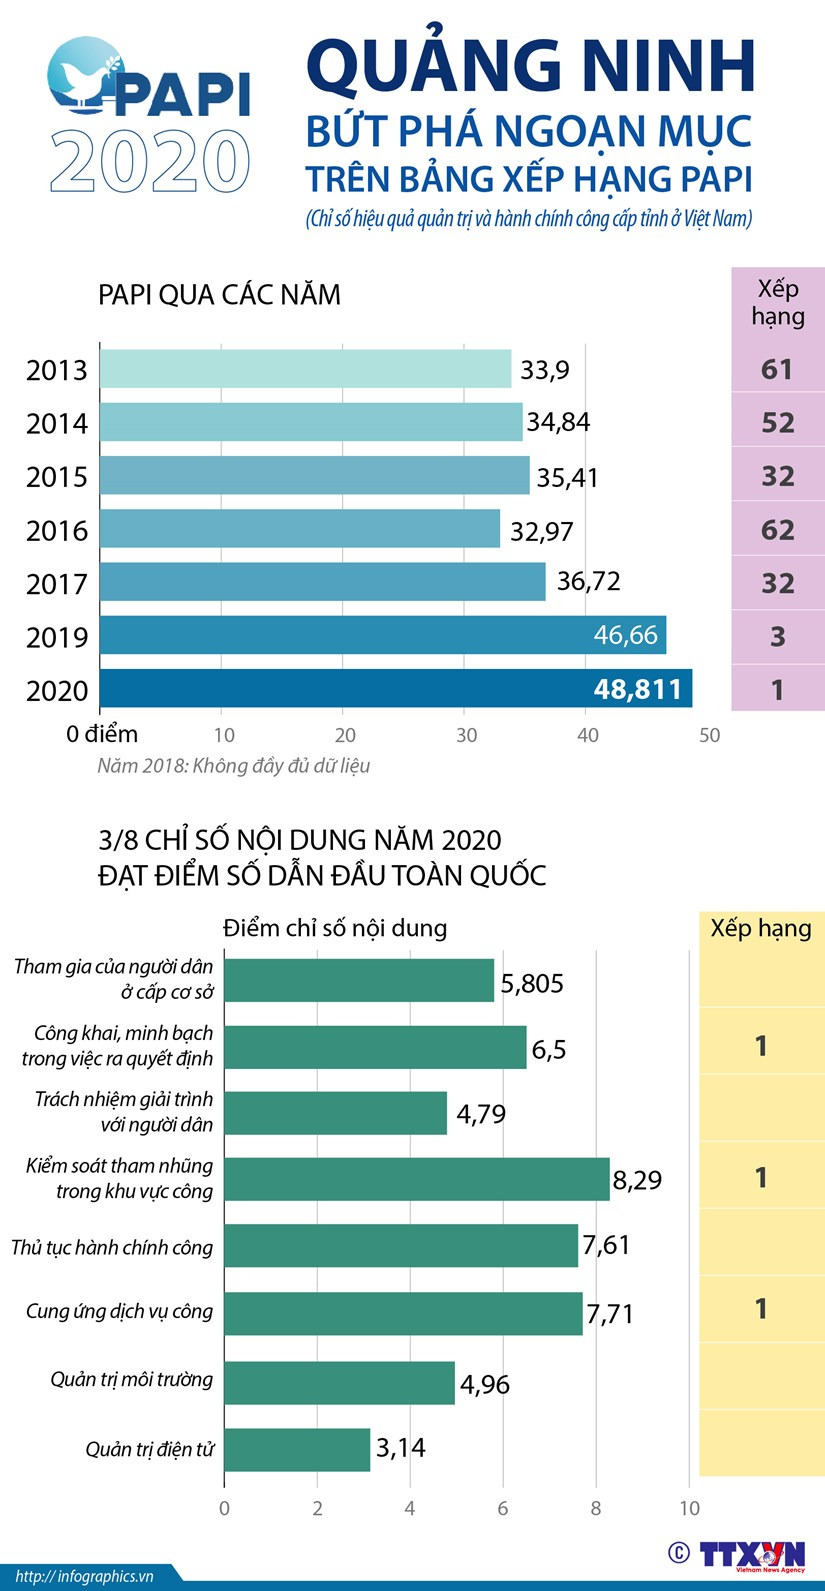 [Infographics] Quang Ninh but pha ngoan muc tren bang xep hang PAPI hinh anh 1